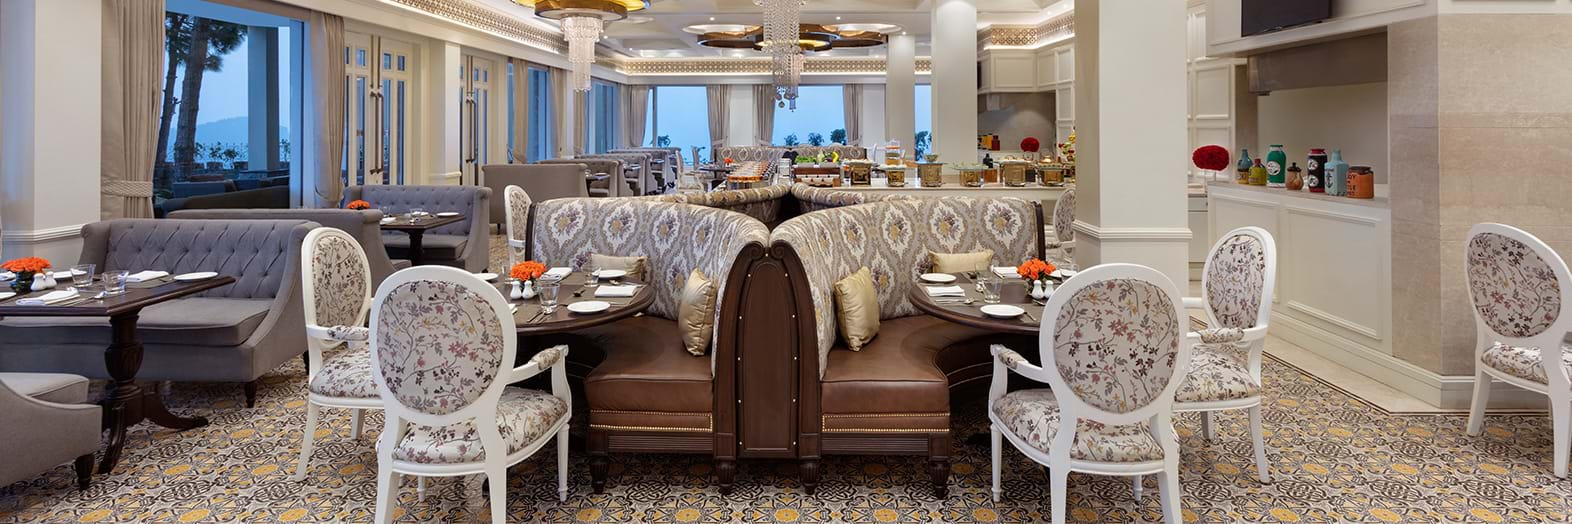 Restaurants in Solan